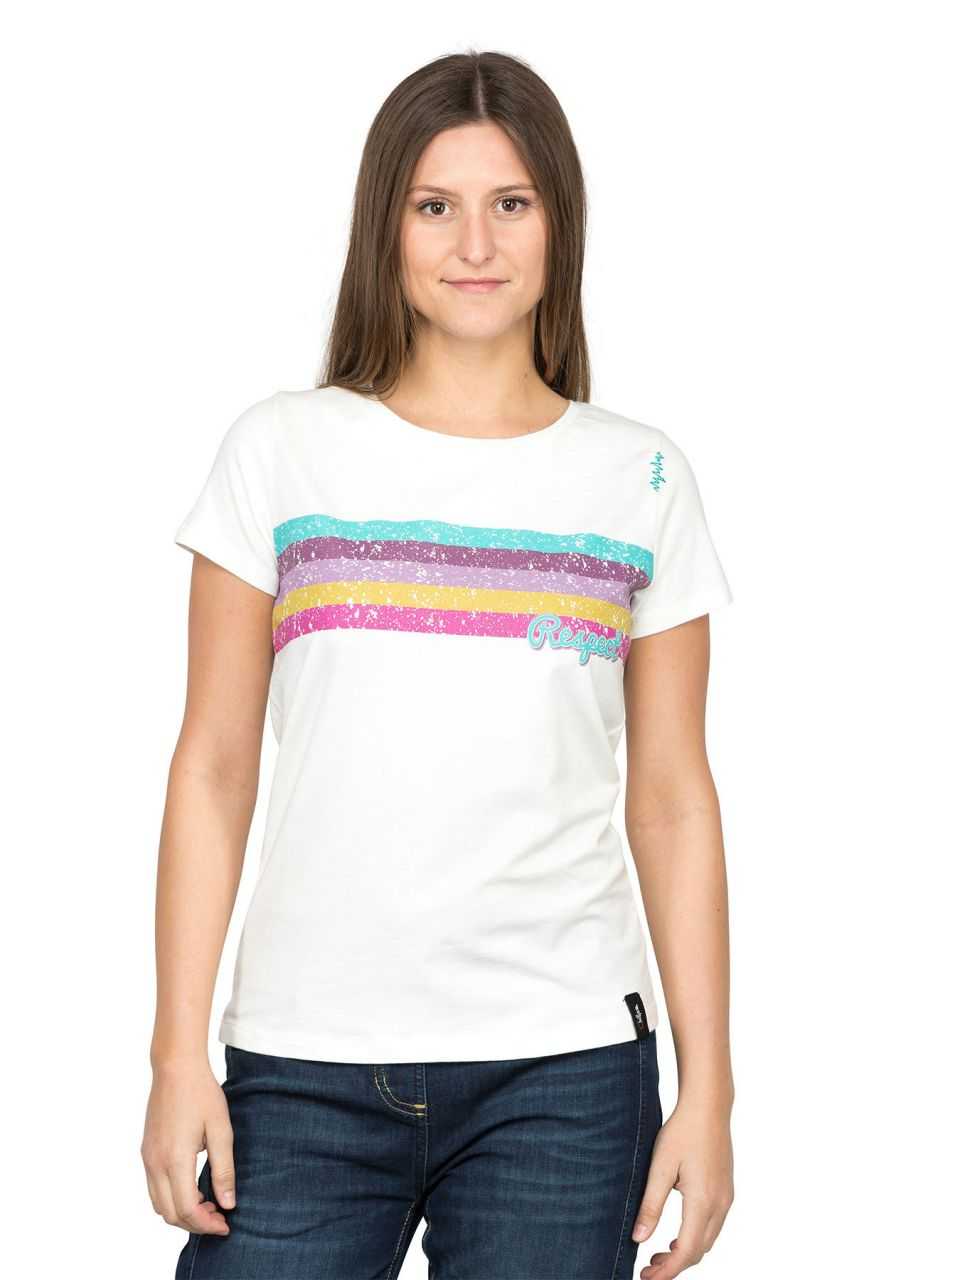 Chillaz Gandia Respect T-Shirt cream S